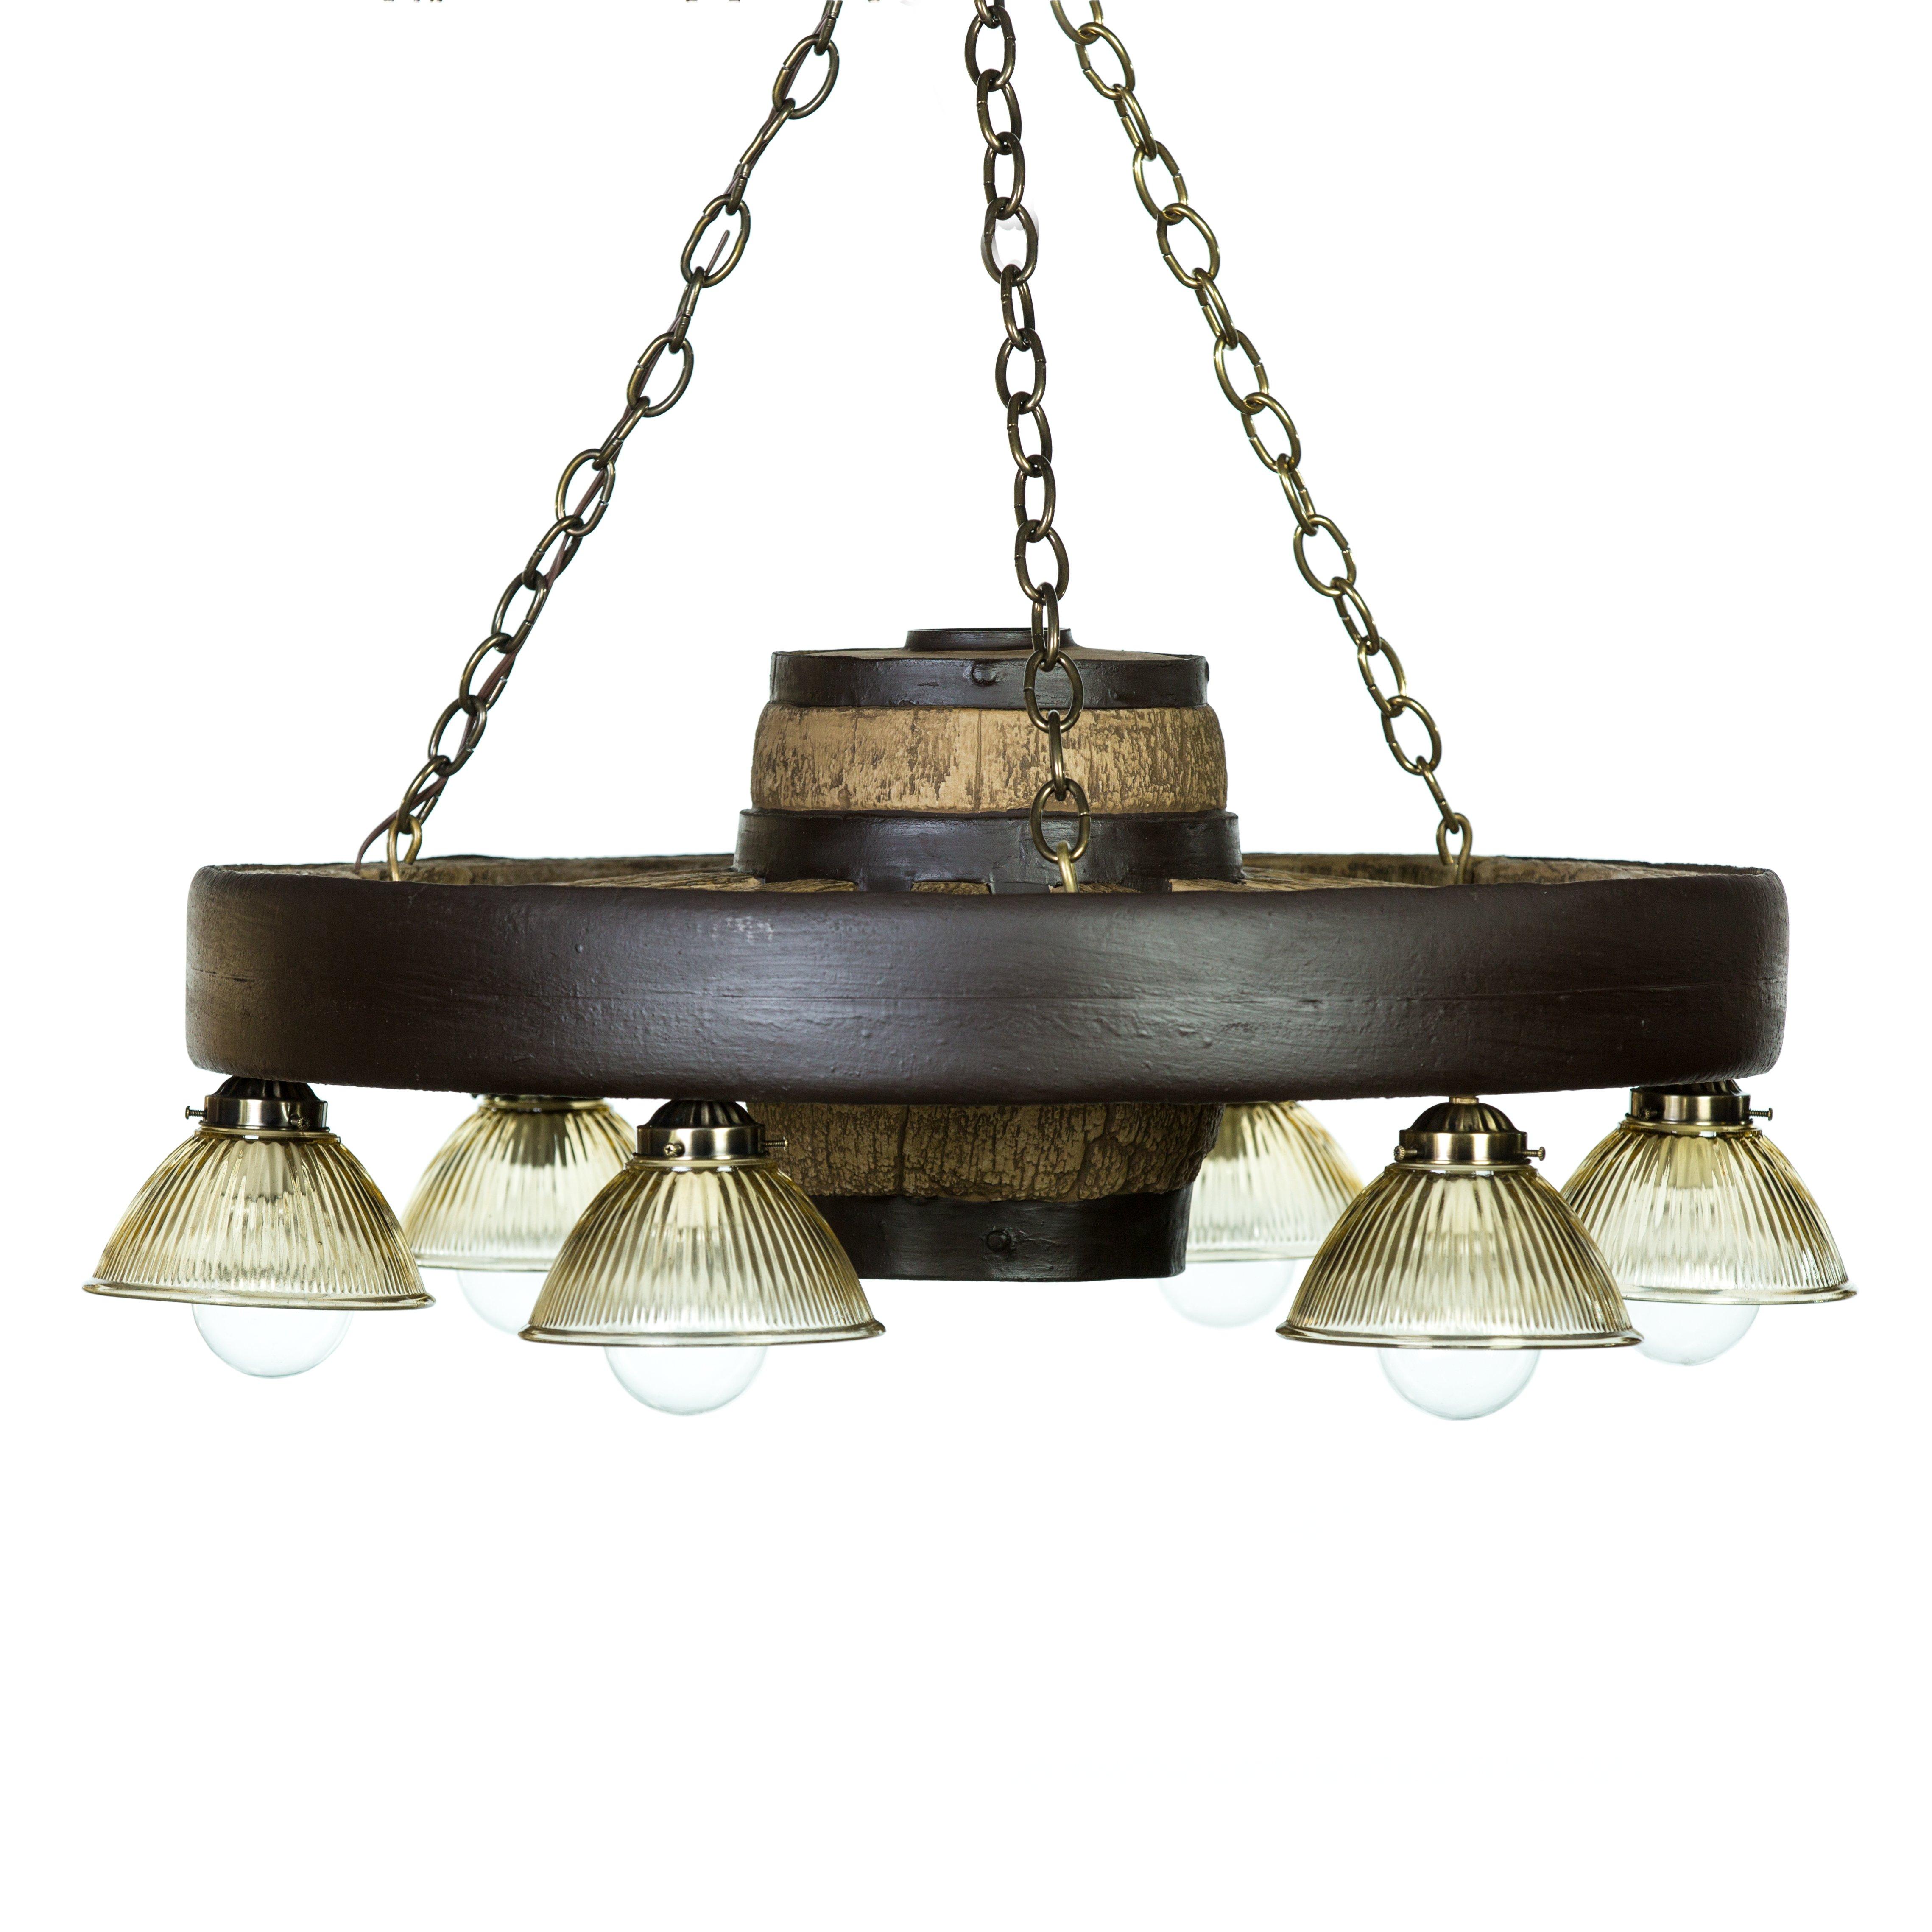 Black Wagon Wheel Light: Small Wagon Wheel Chandelier With Downlights